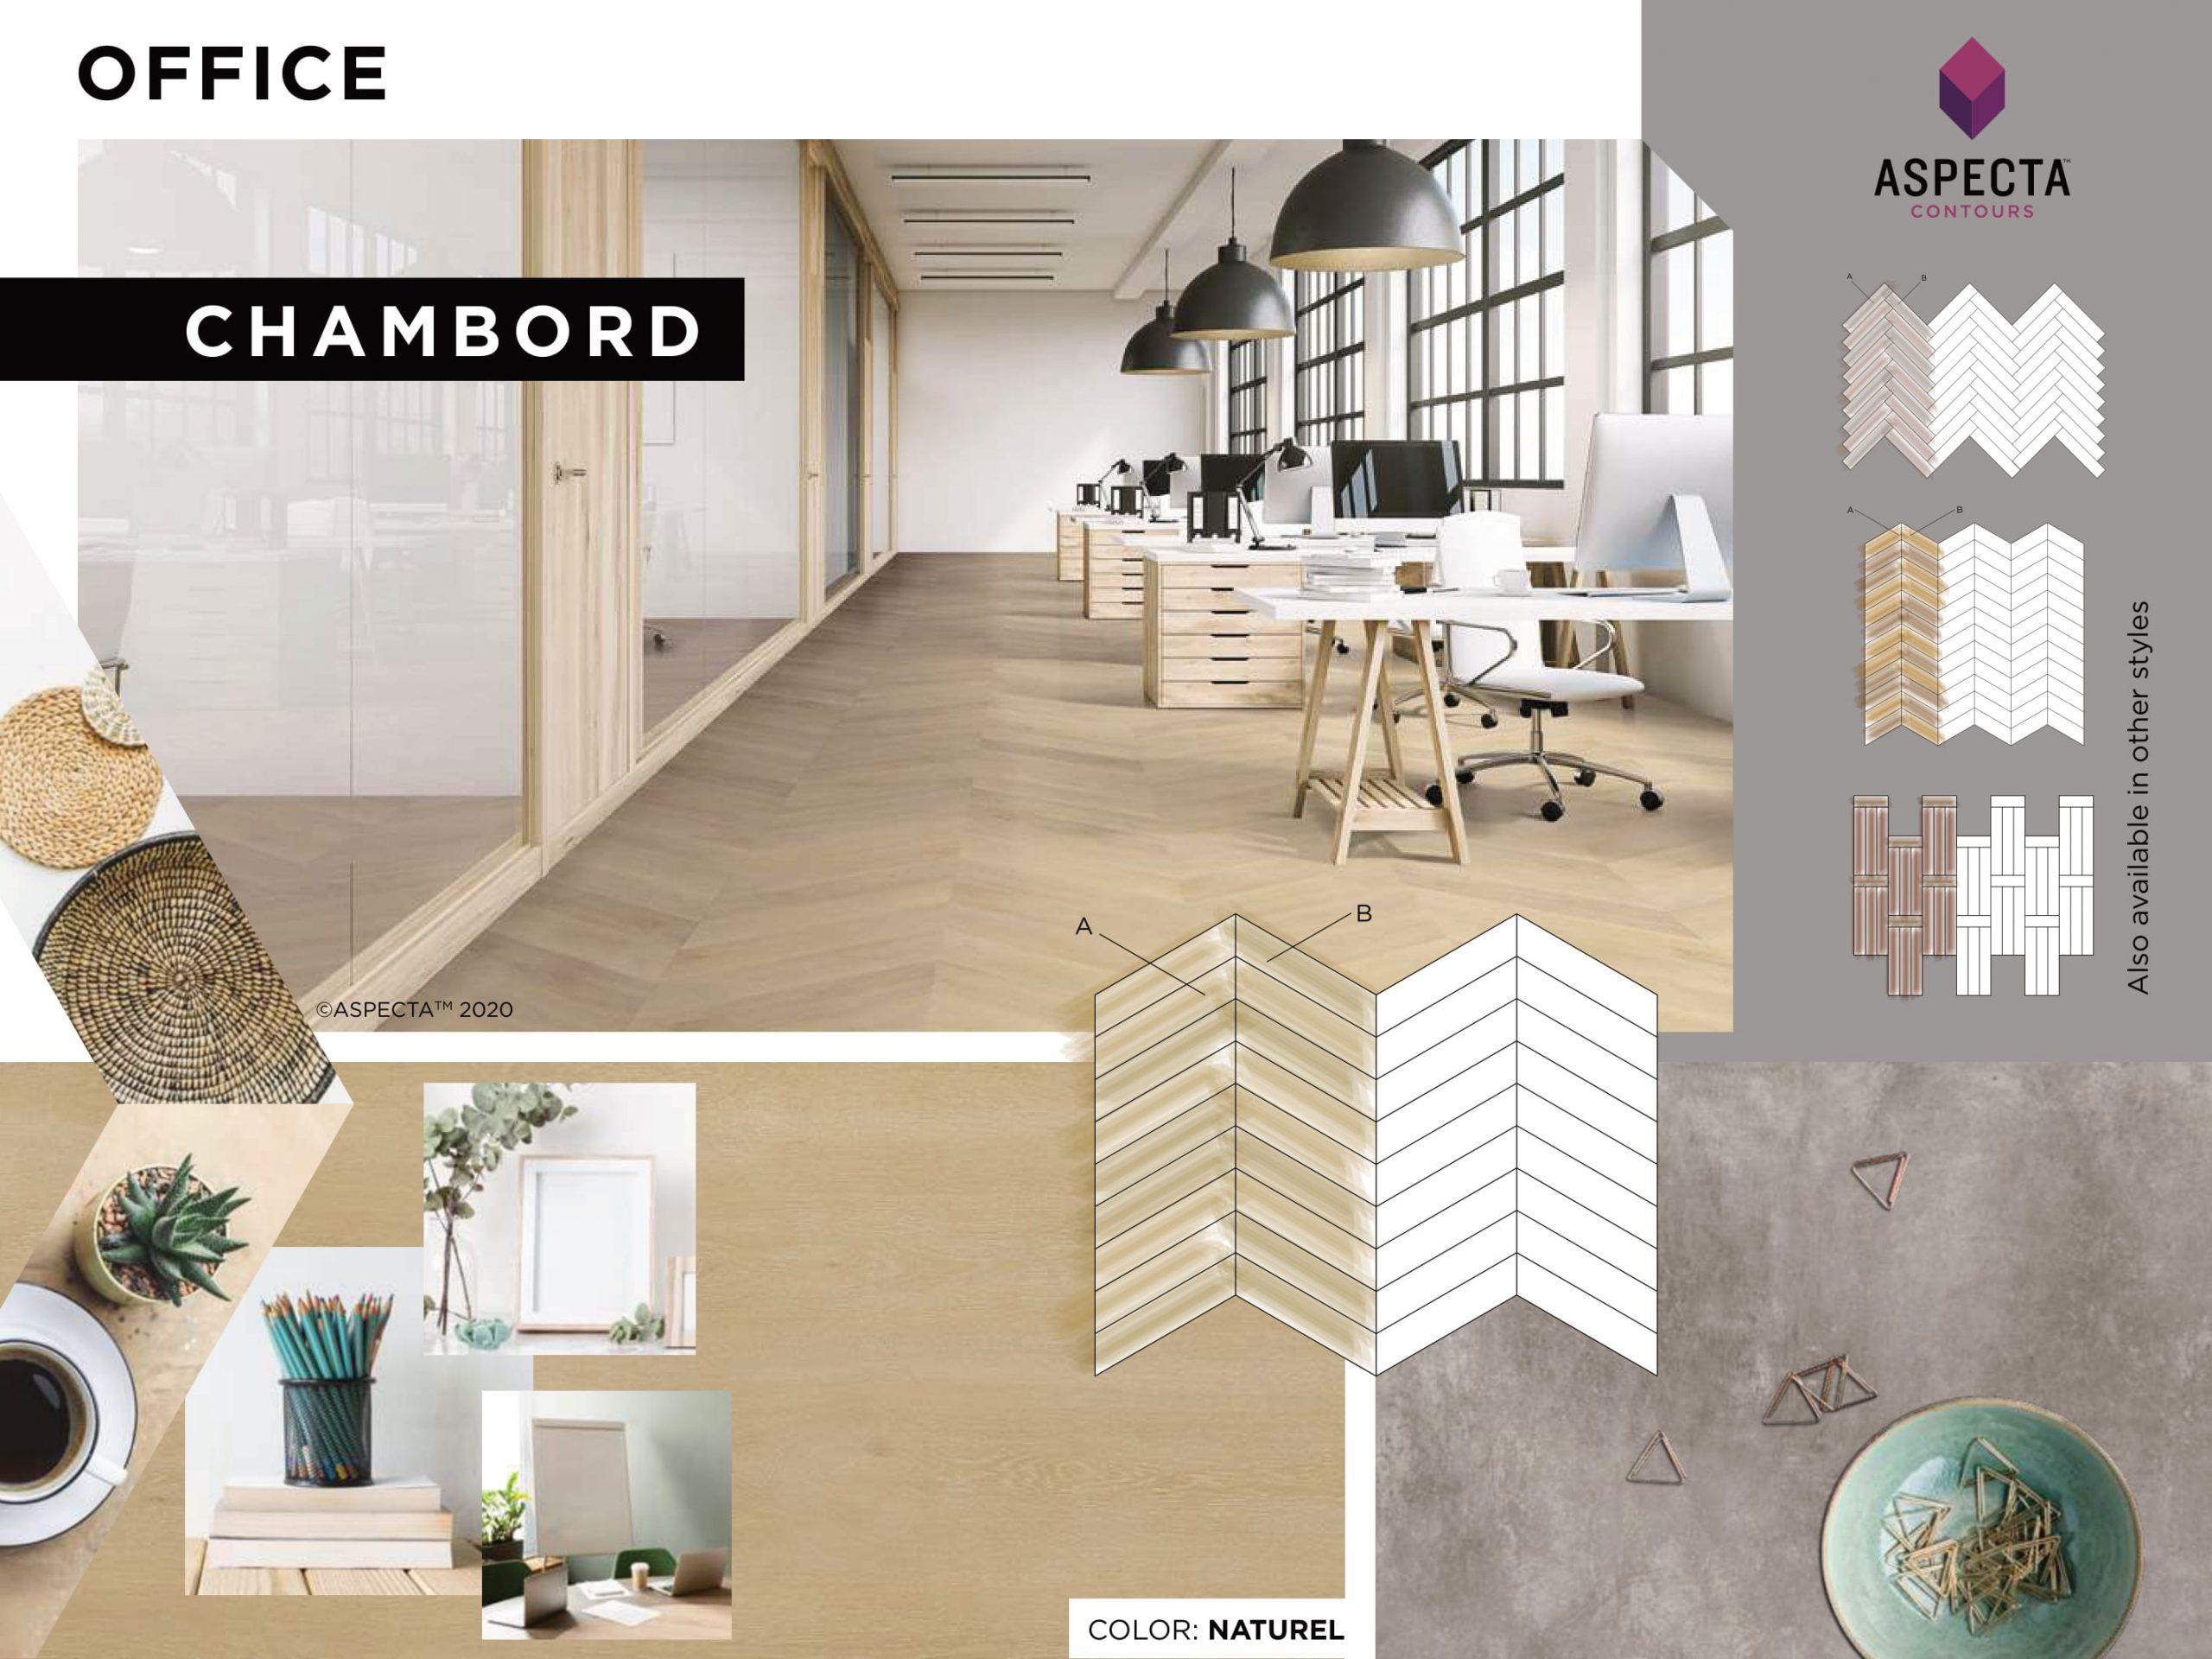 03_ASP_Contours_Moodboard_Chambord_Office_web_04_2020-1